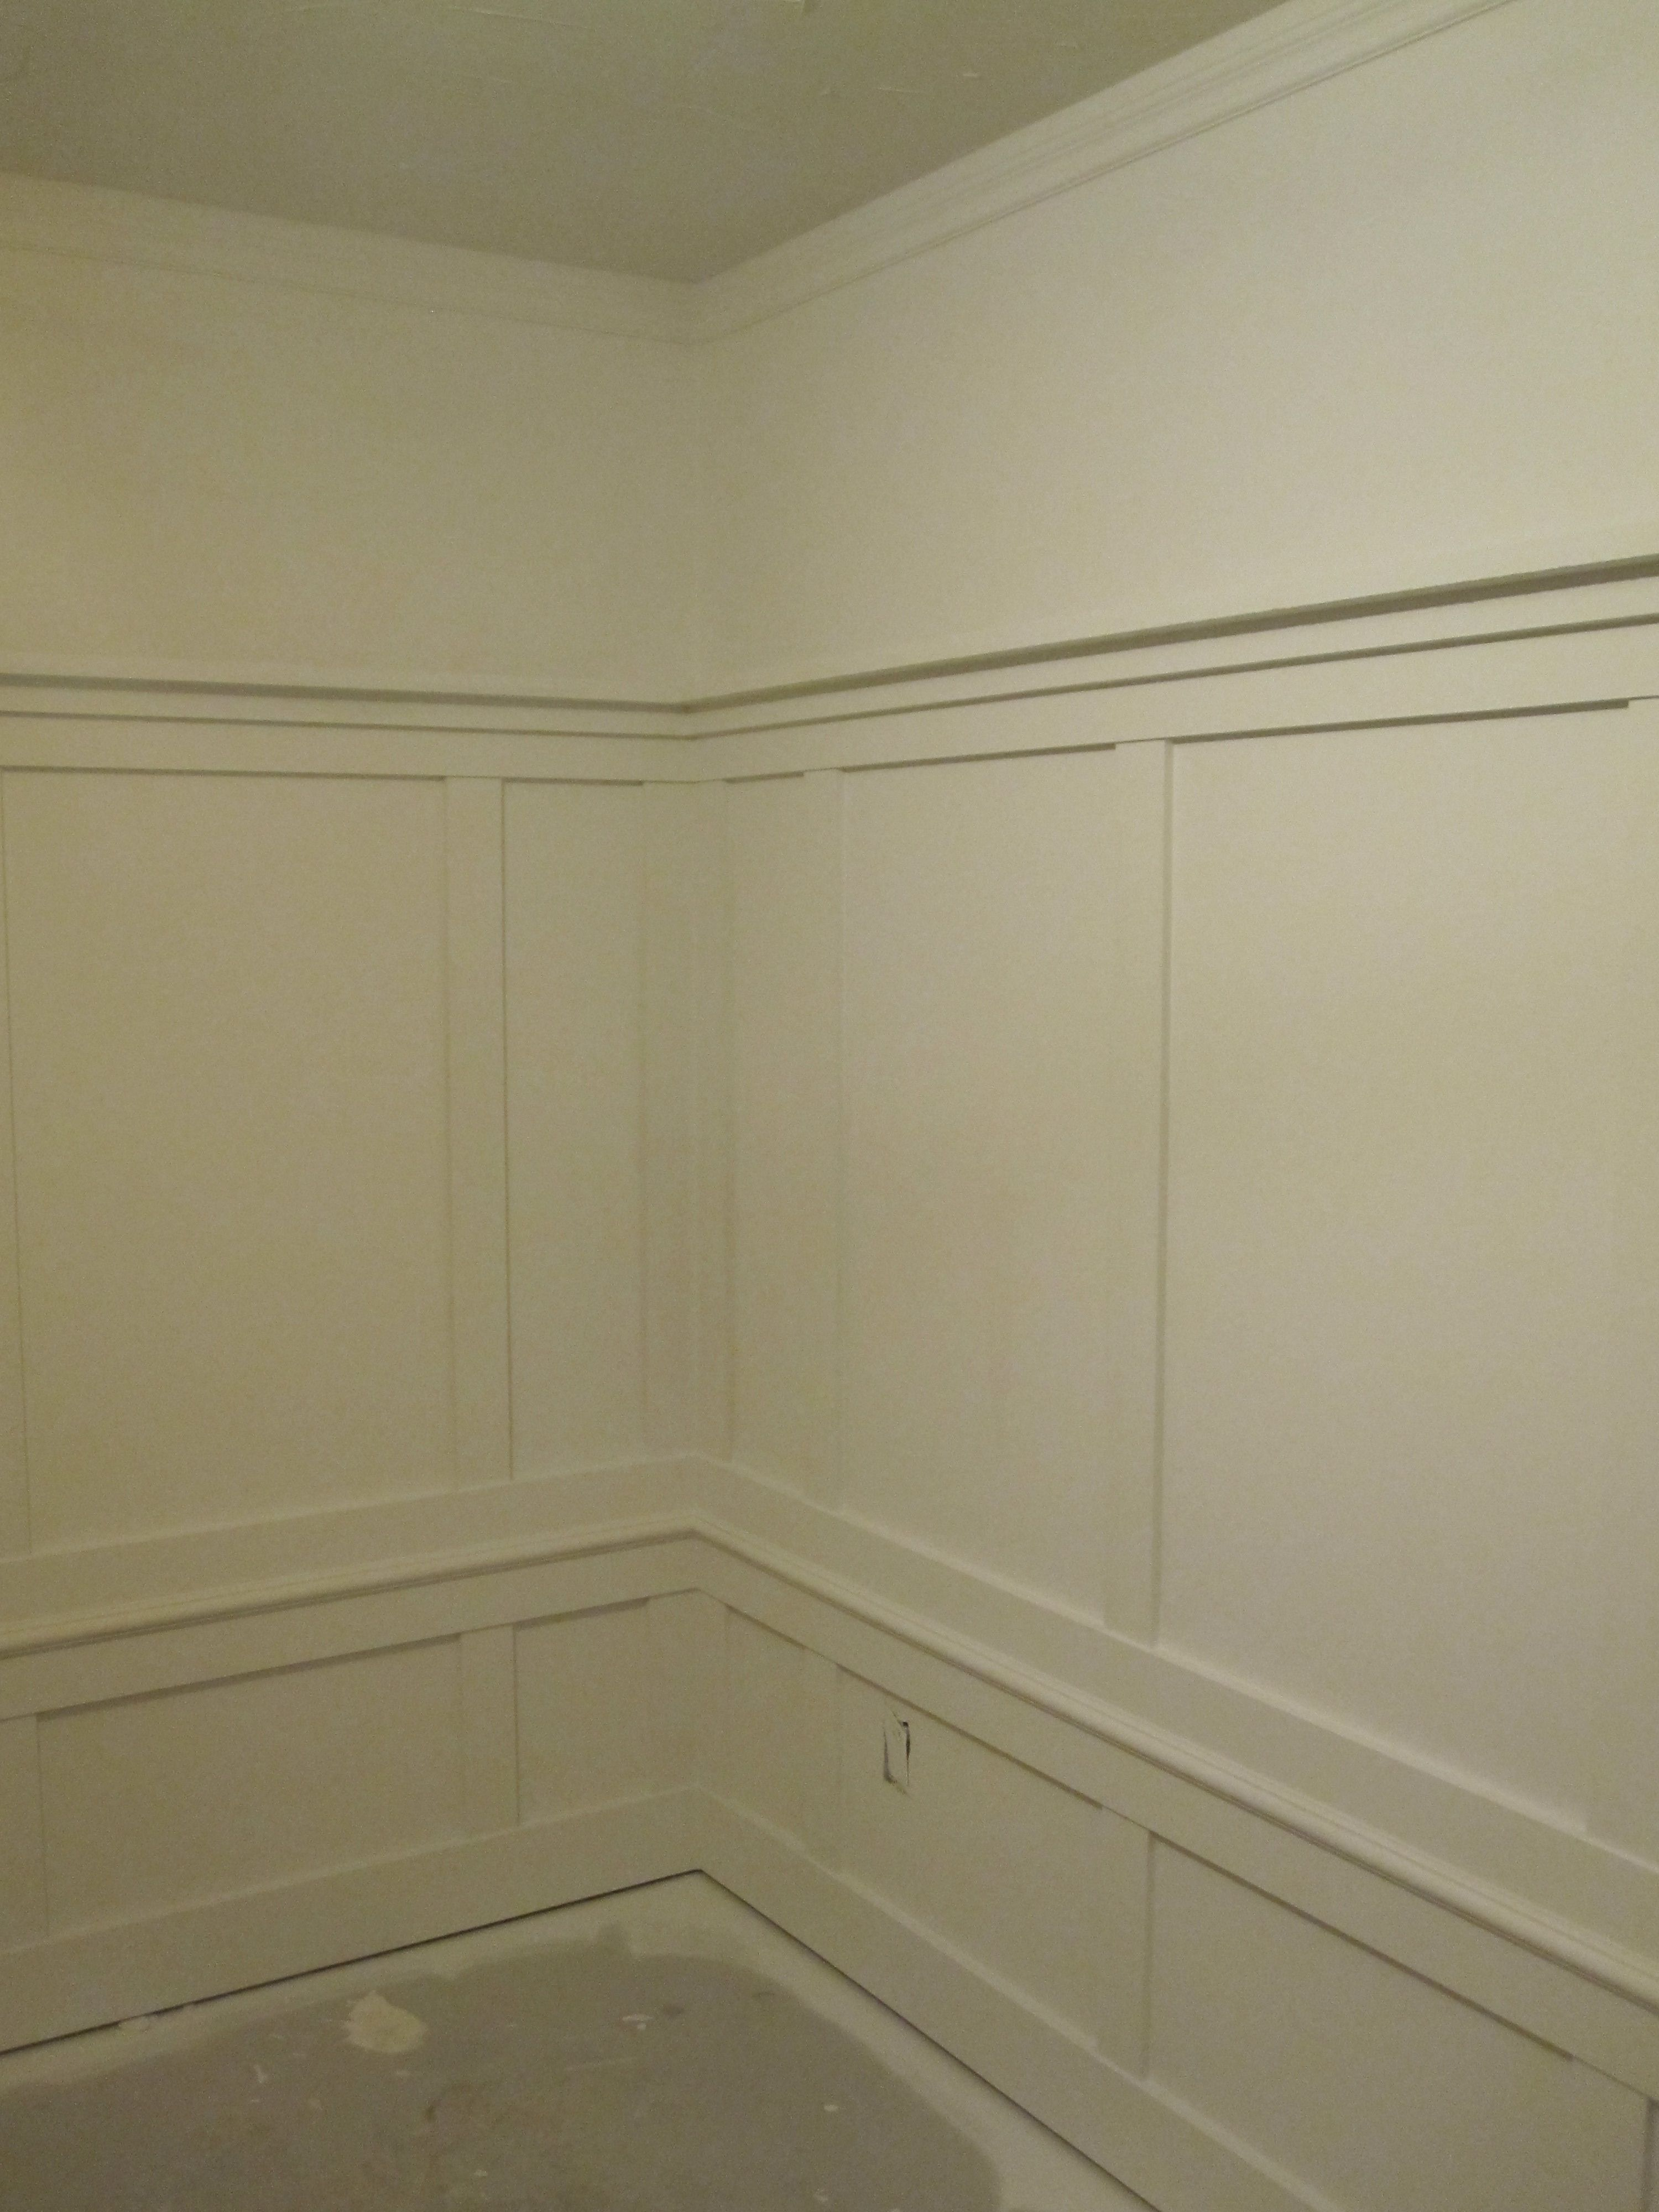 Faux Wainscoting Wallpaper Wainscoting 2 Levels Wallpaper Top Coastal Living